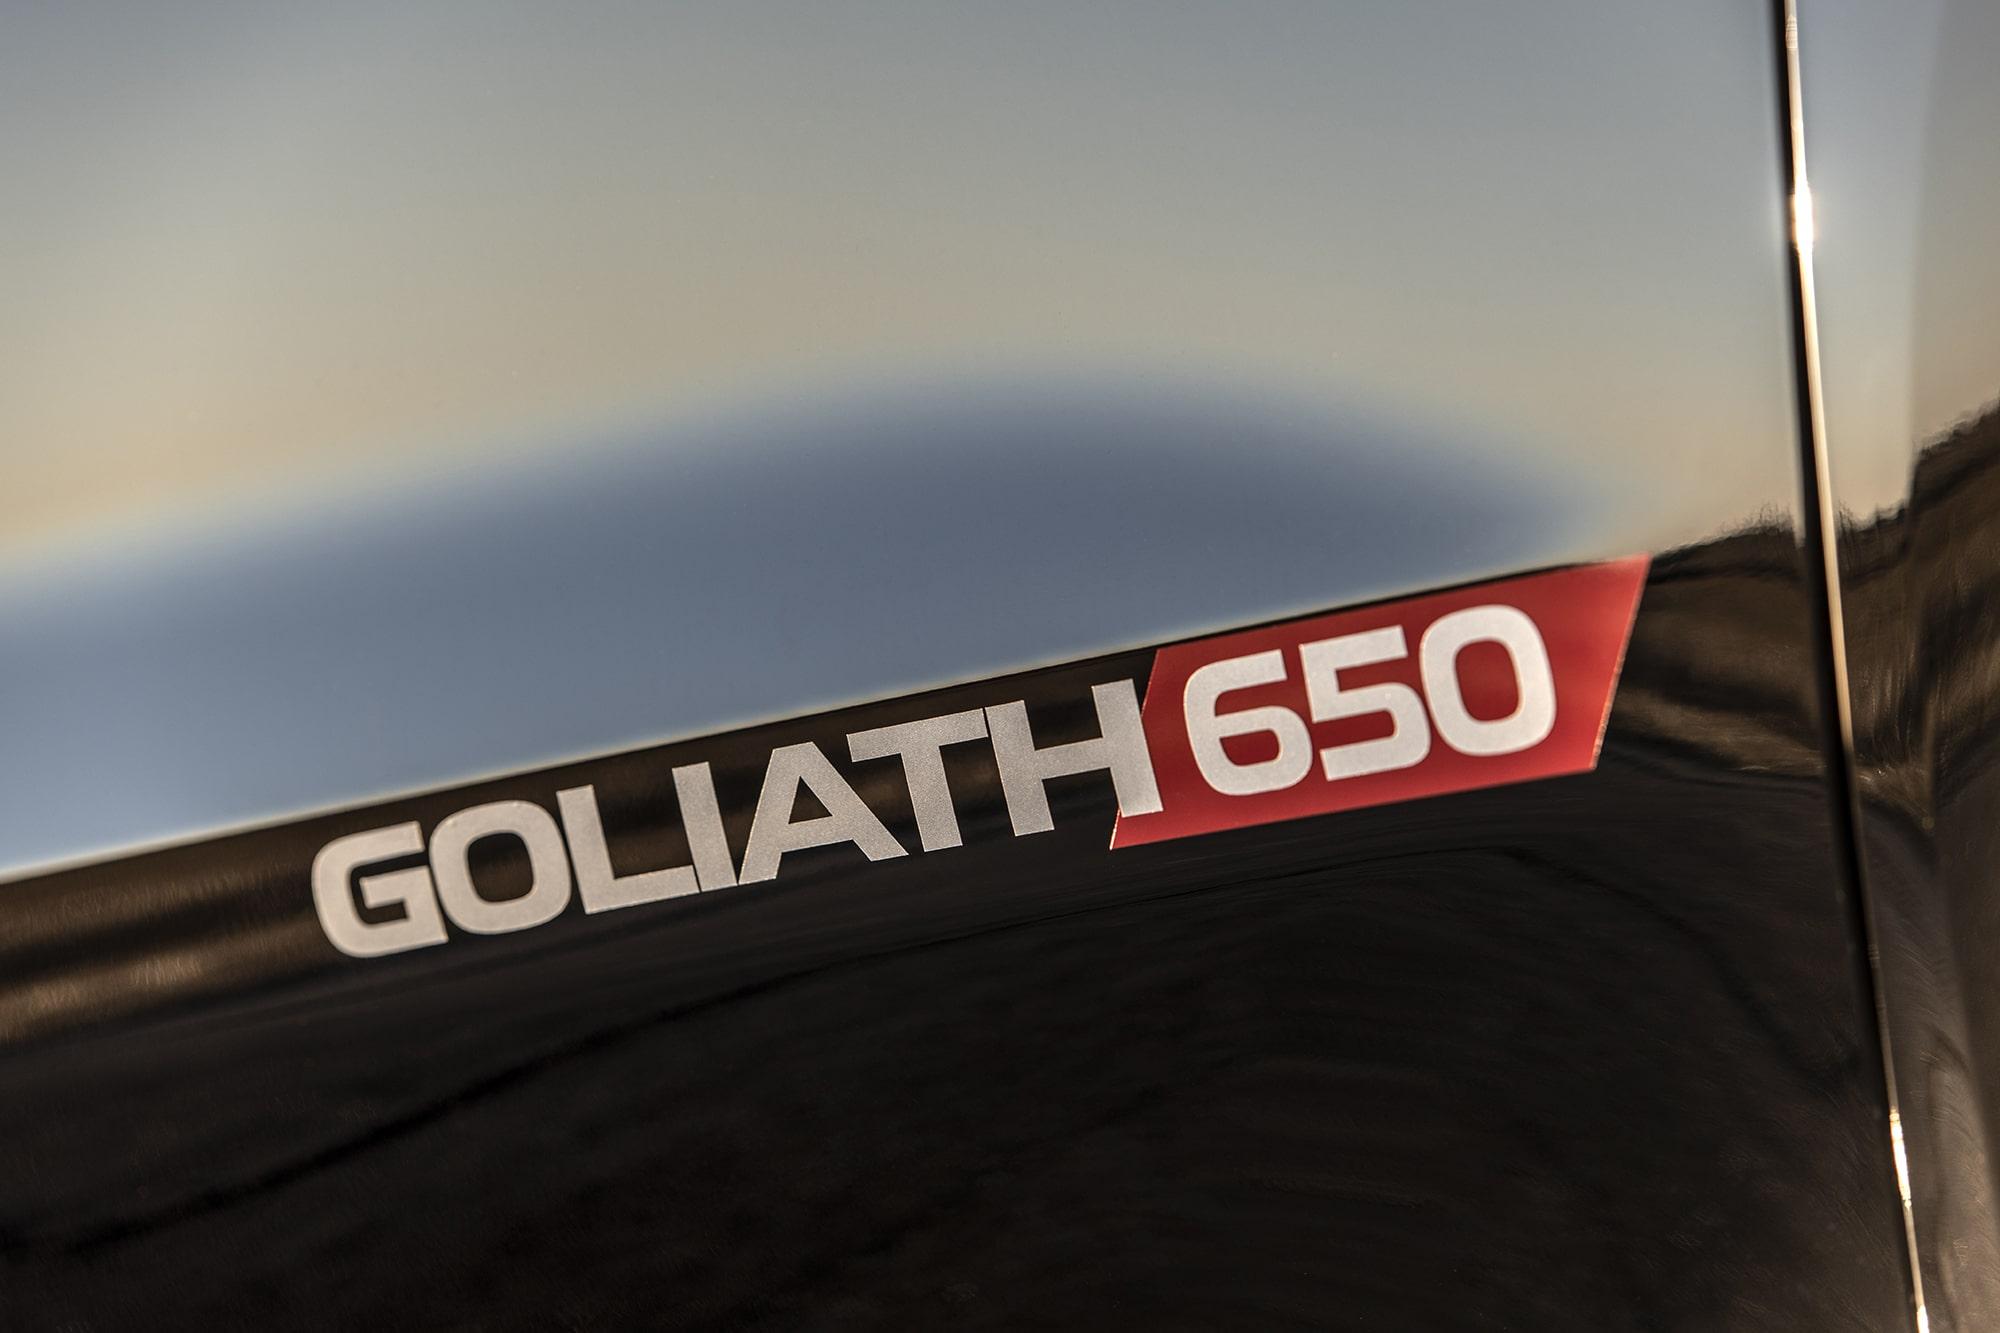 Hennessey GOLIATH 650 Silverado Supercharged Truck